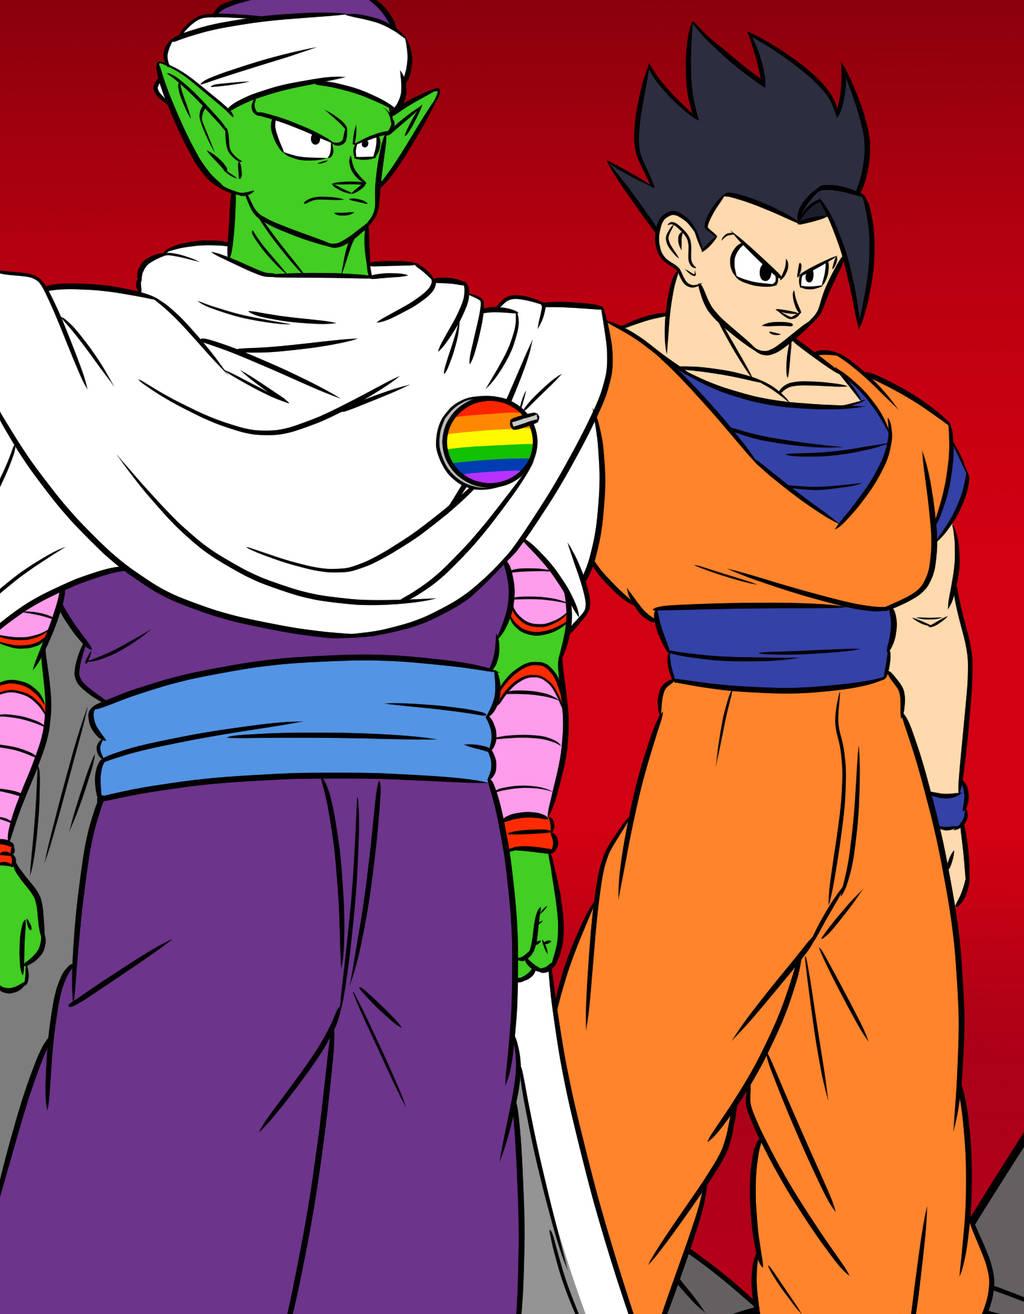 Piccolo and gohan by kish95